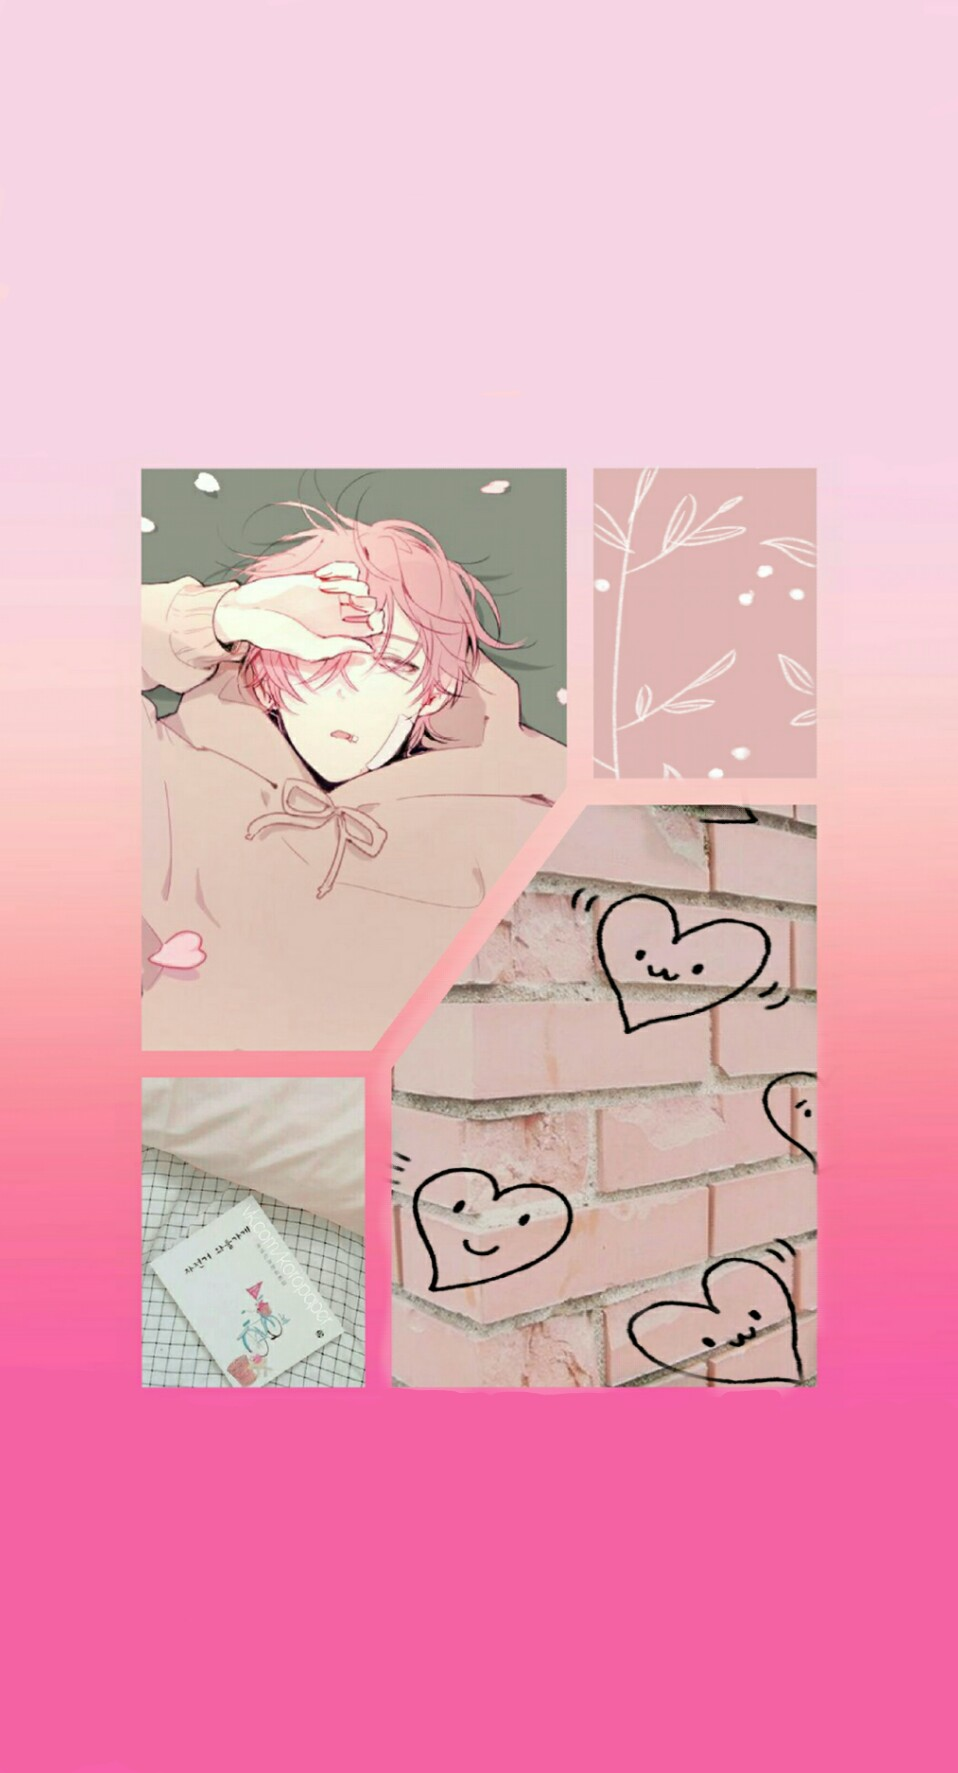 Aesthetic Boy Cool Anime Wallpapers